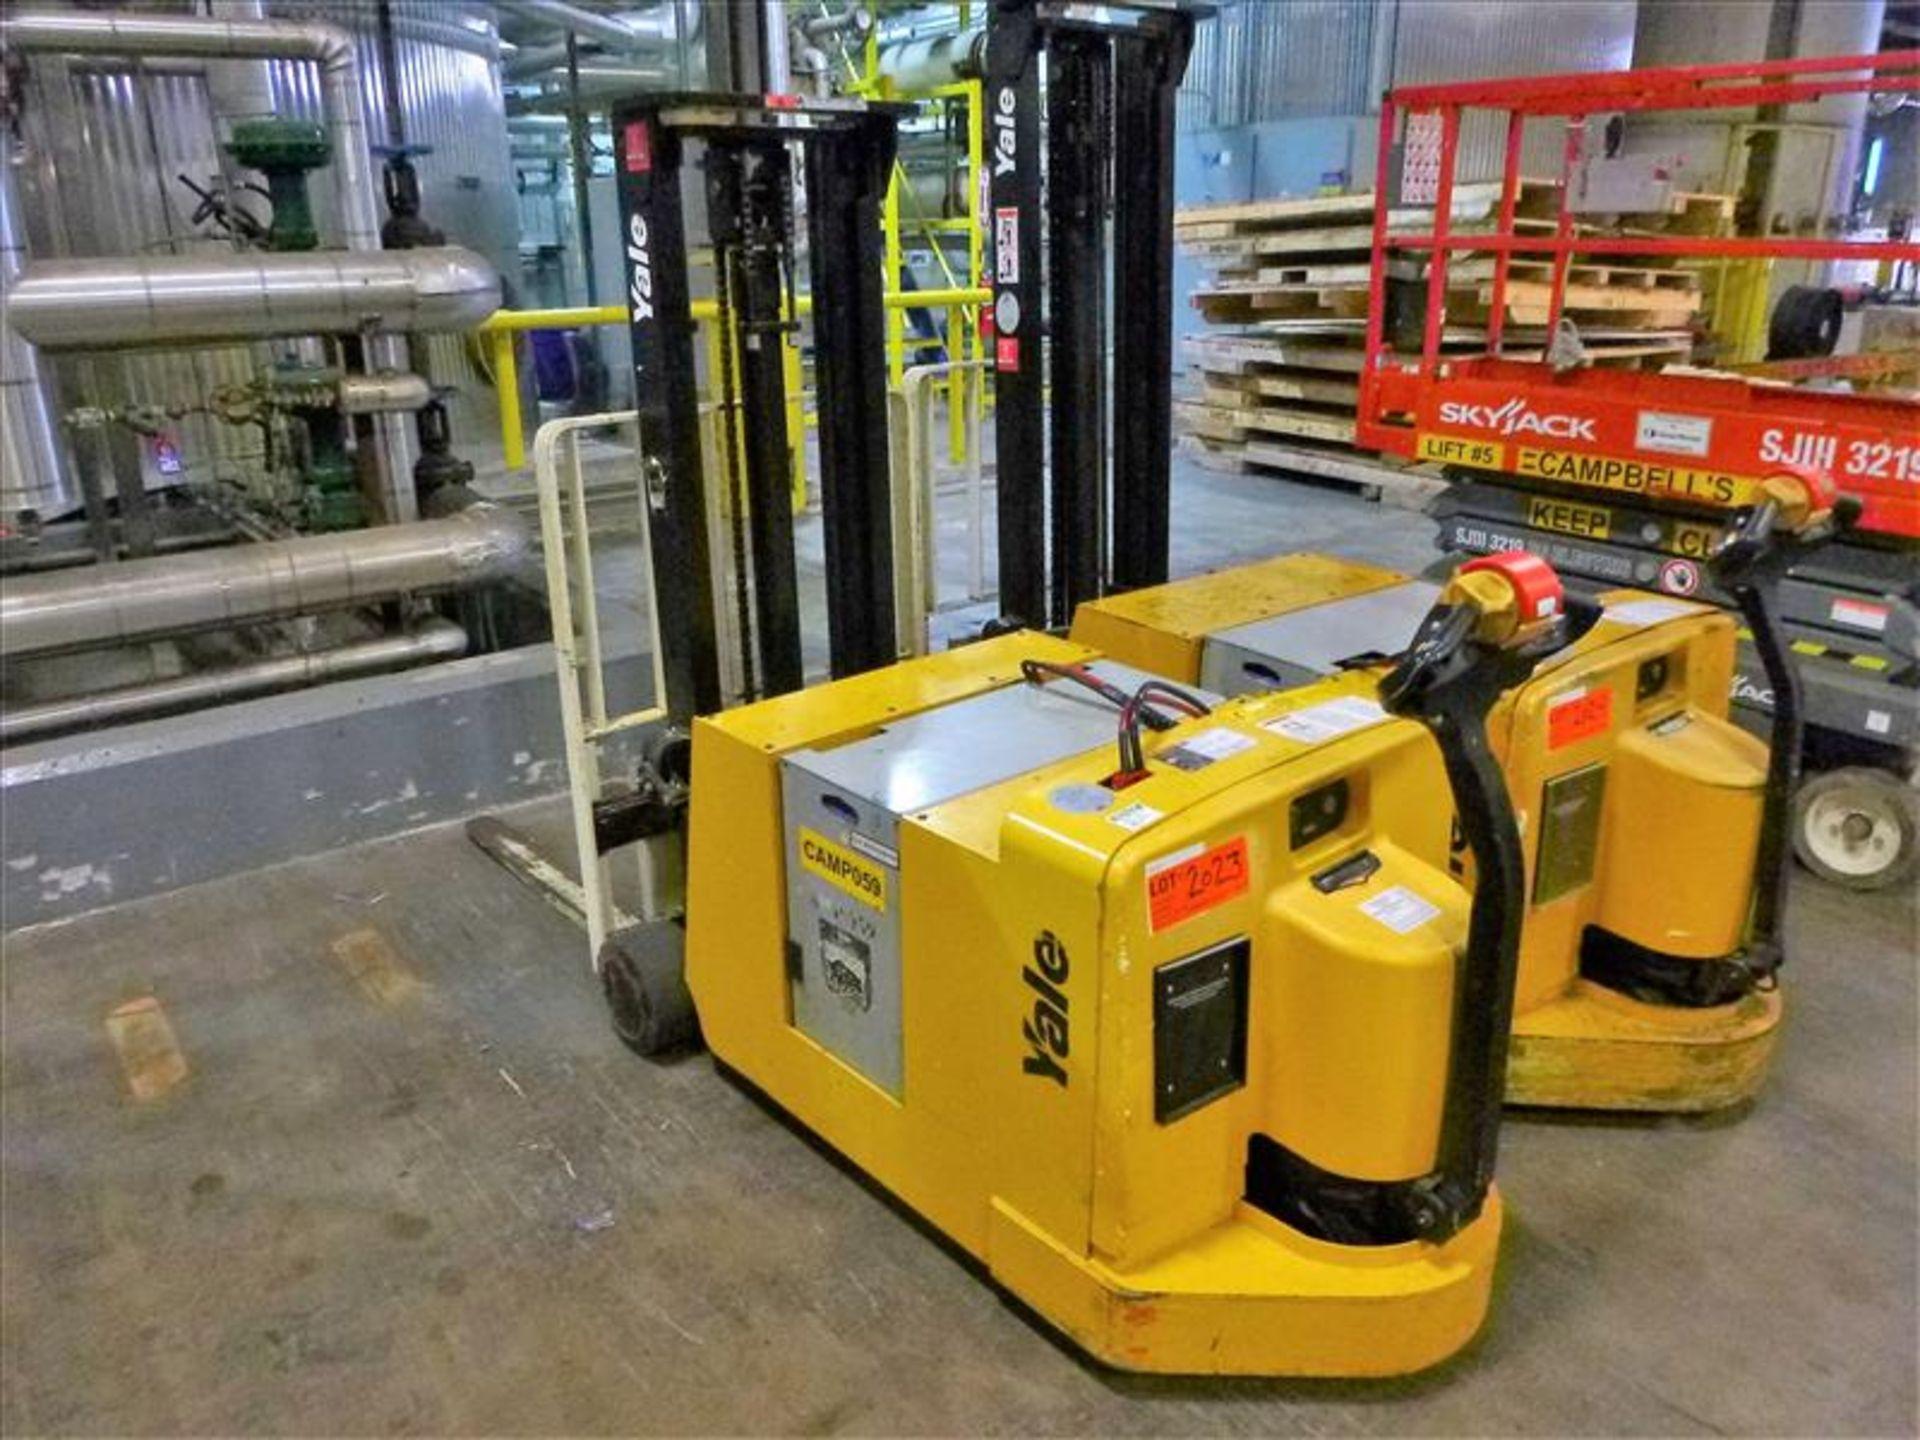 Yale walk-behind fork lift truck, mod. MCW030LEN24TV072, ser. no. C819N02806N, 24V electric, 3000